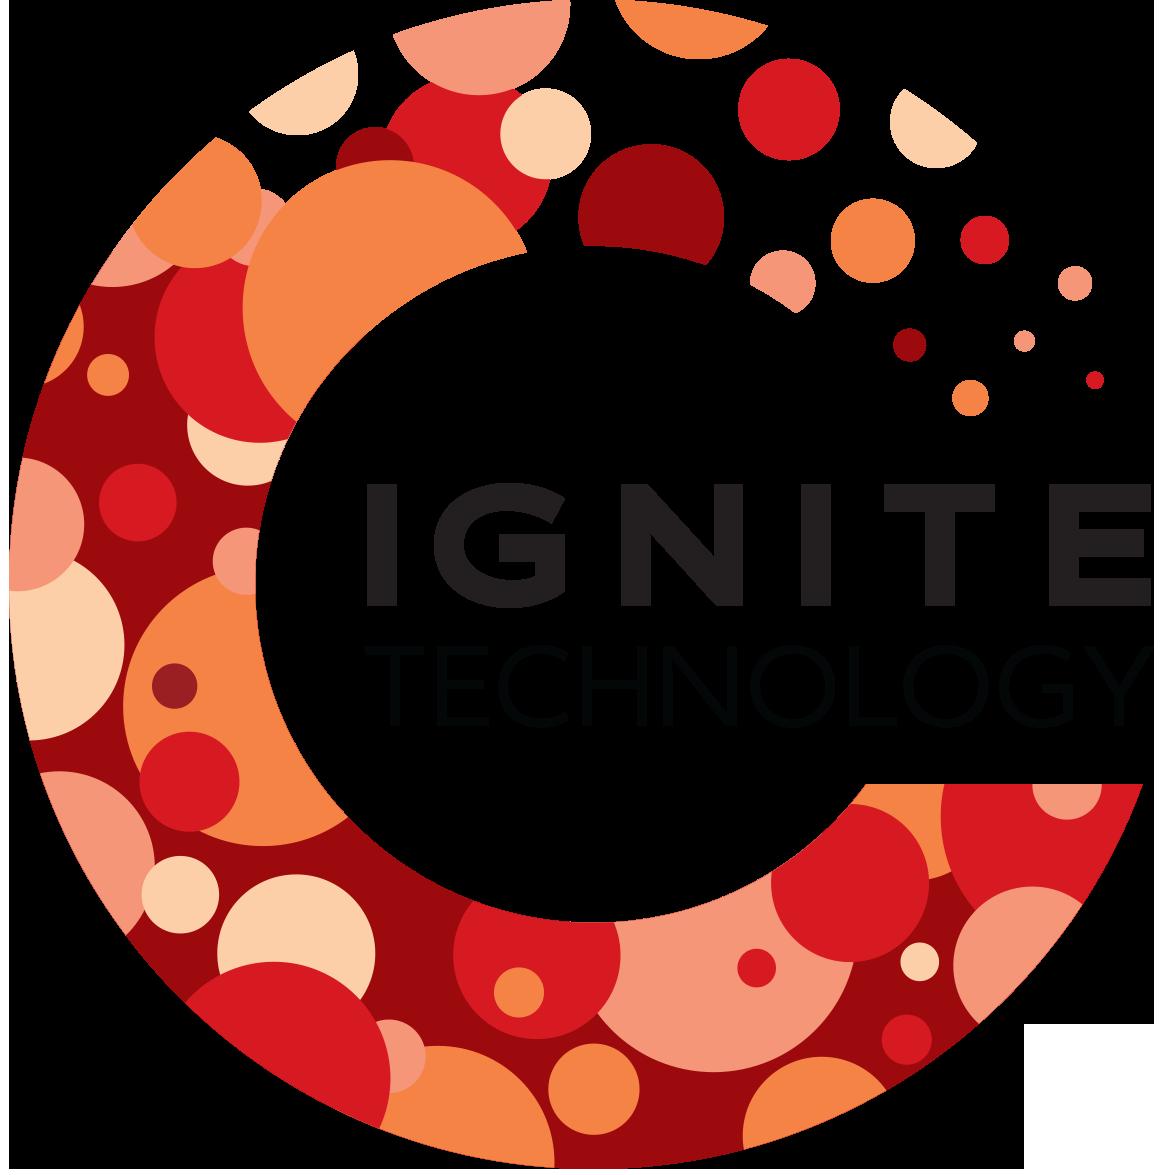 Ignite Technology